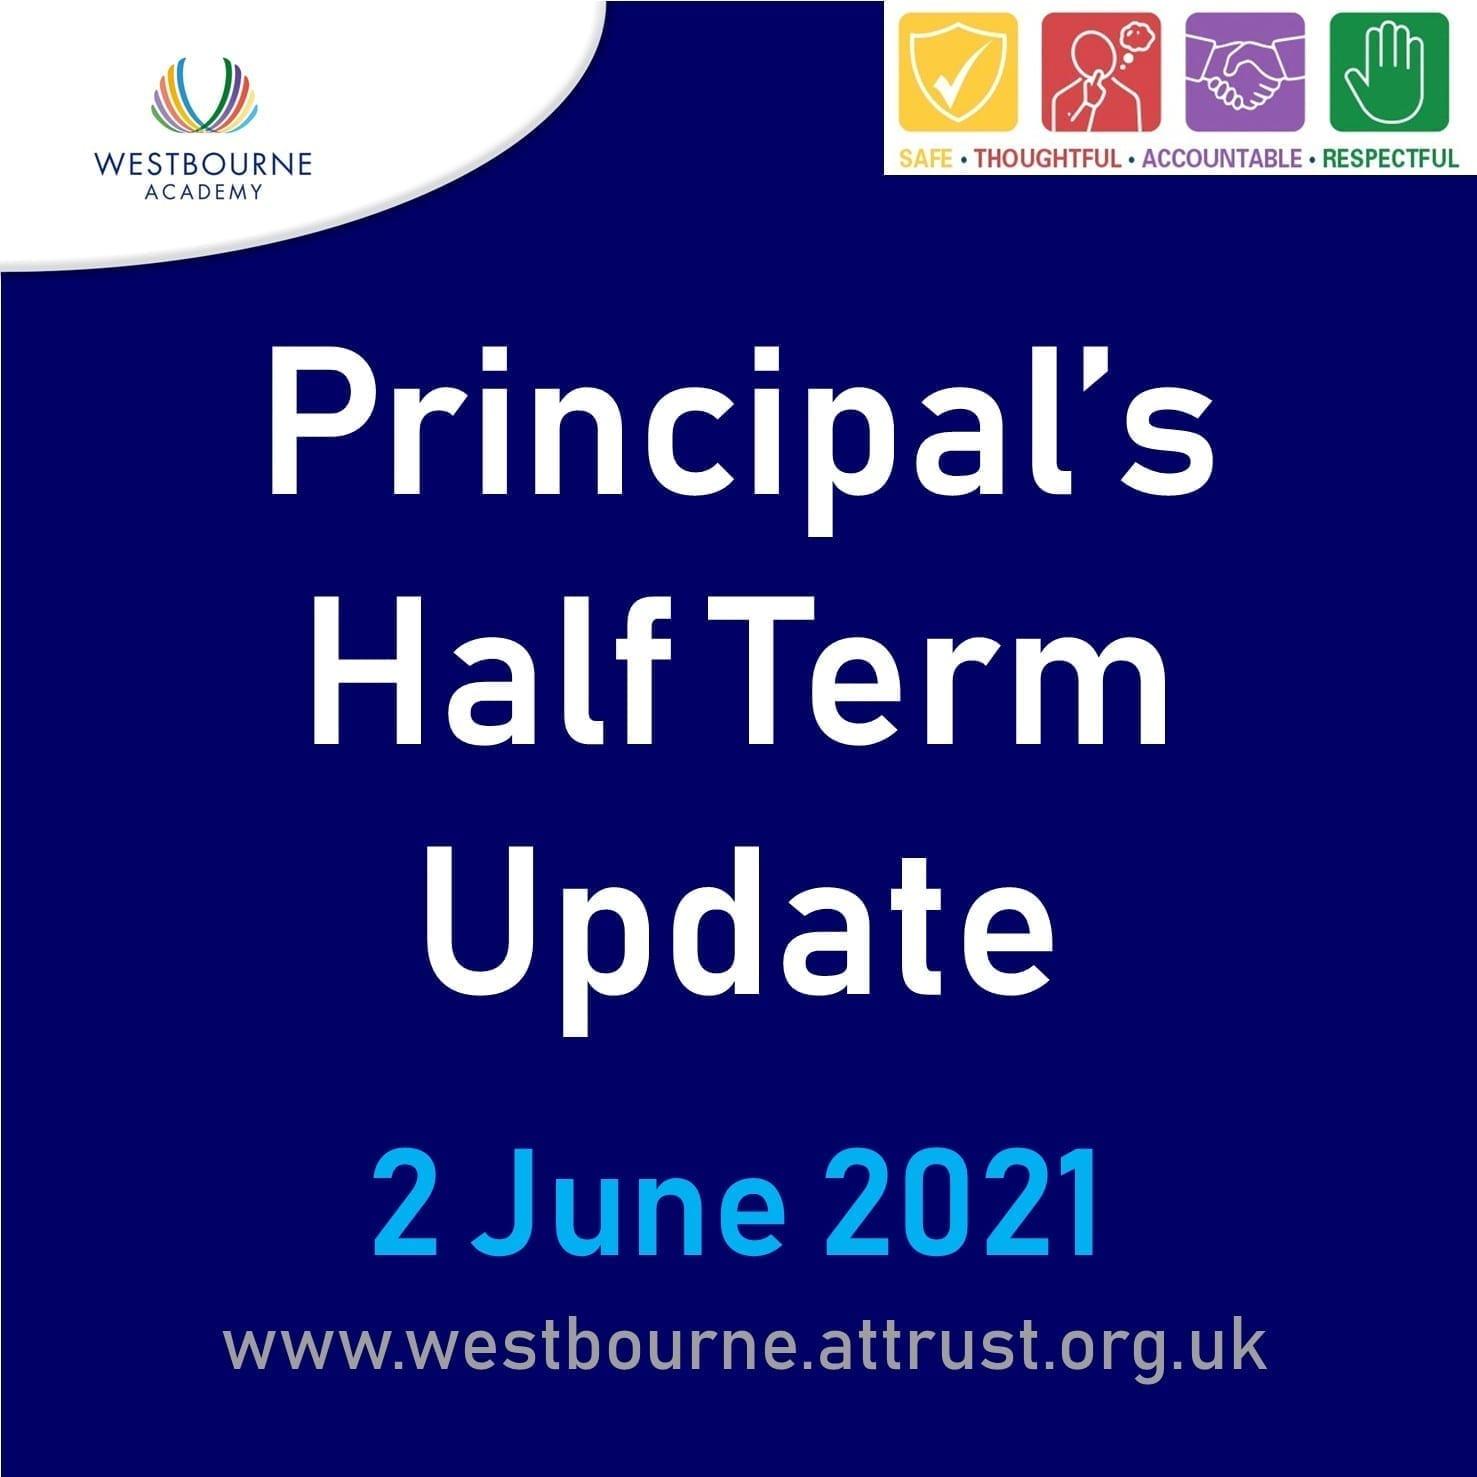 Principal's Half Term Update 2 June 2021